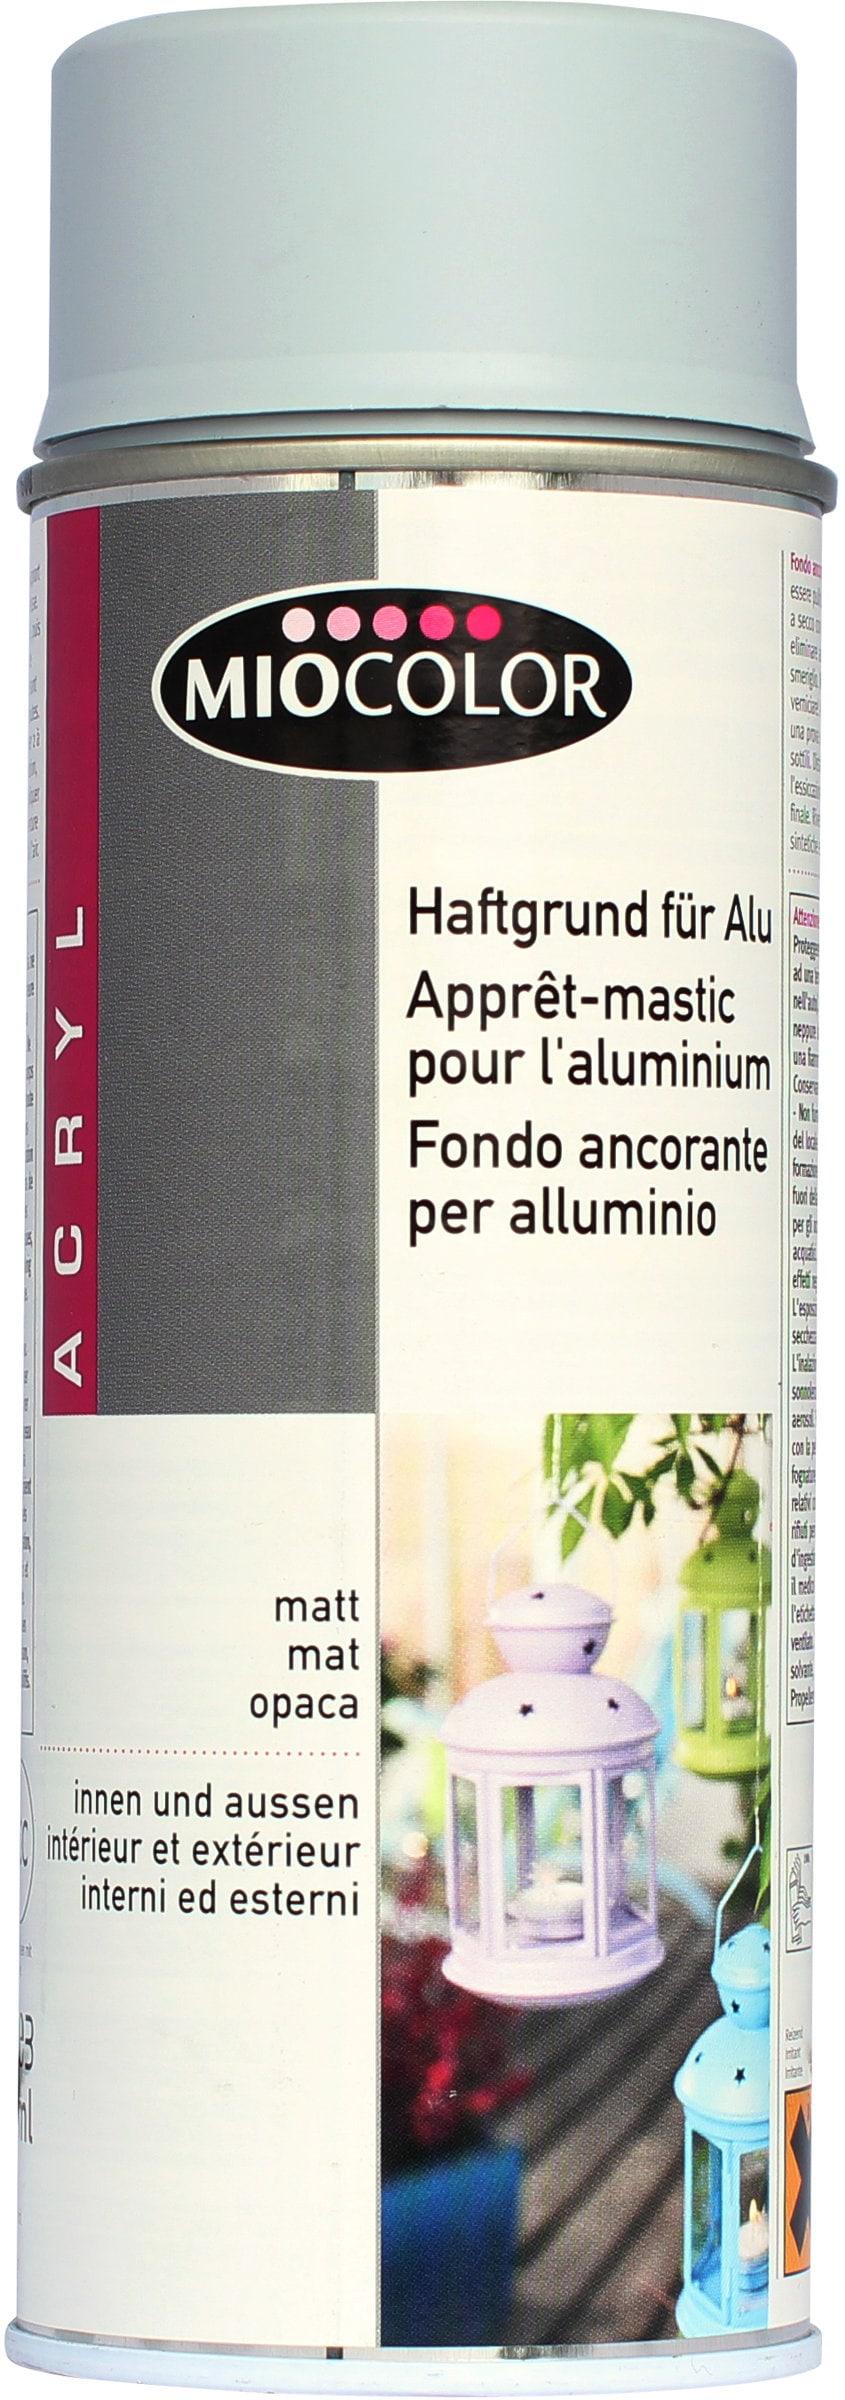 miocolor haftgrund f r aluminium spray migros. Black Bedroom Furniture Sets. Home Design Ideas